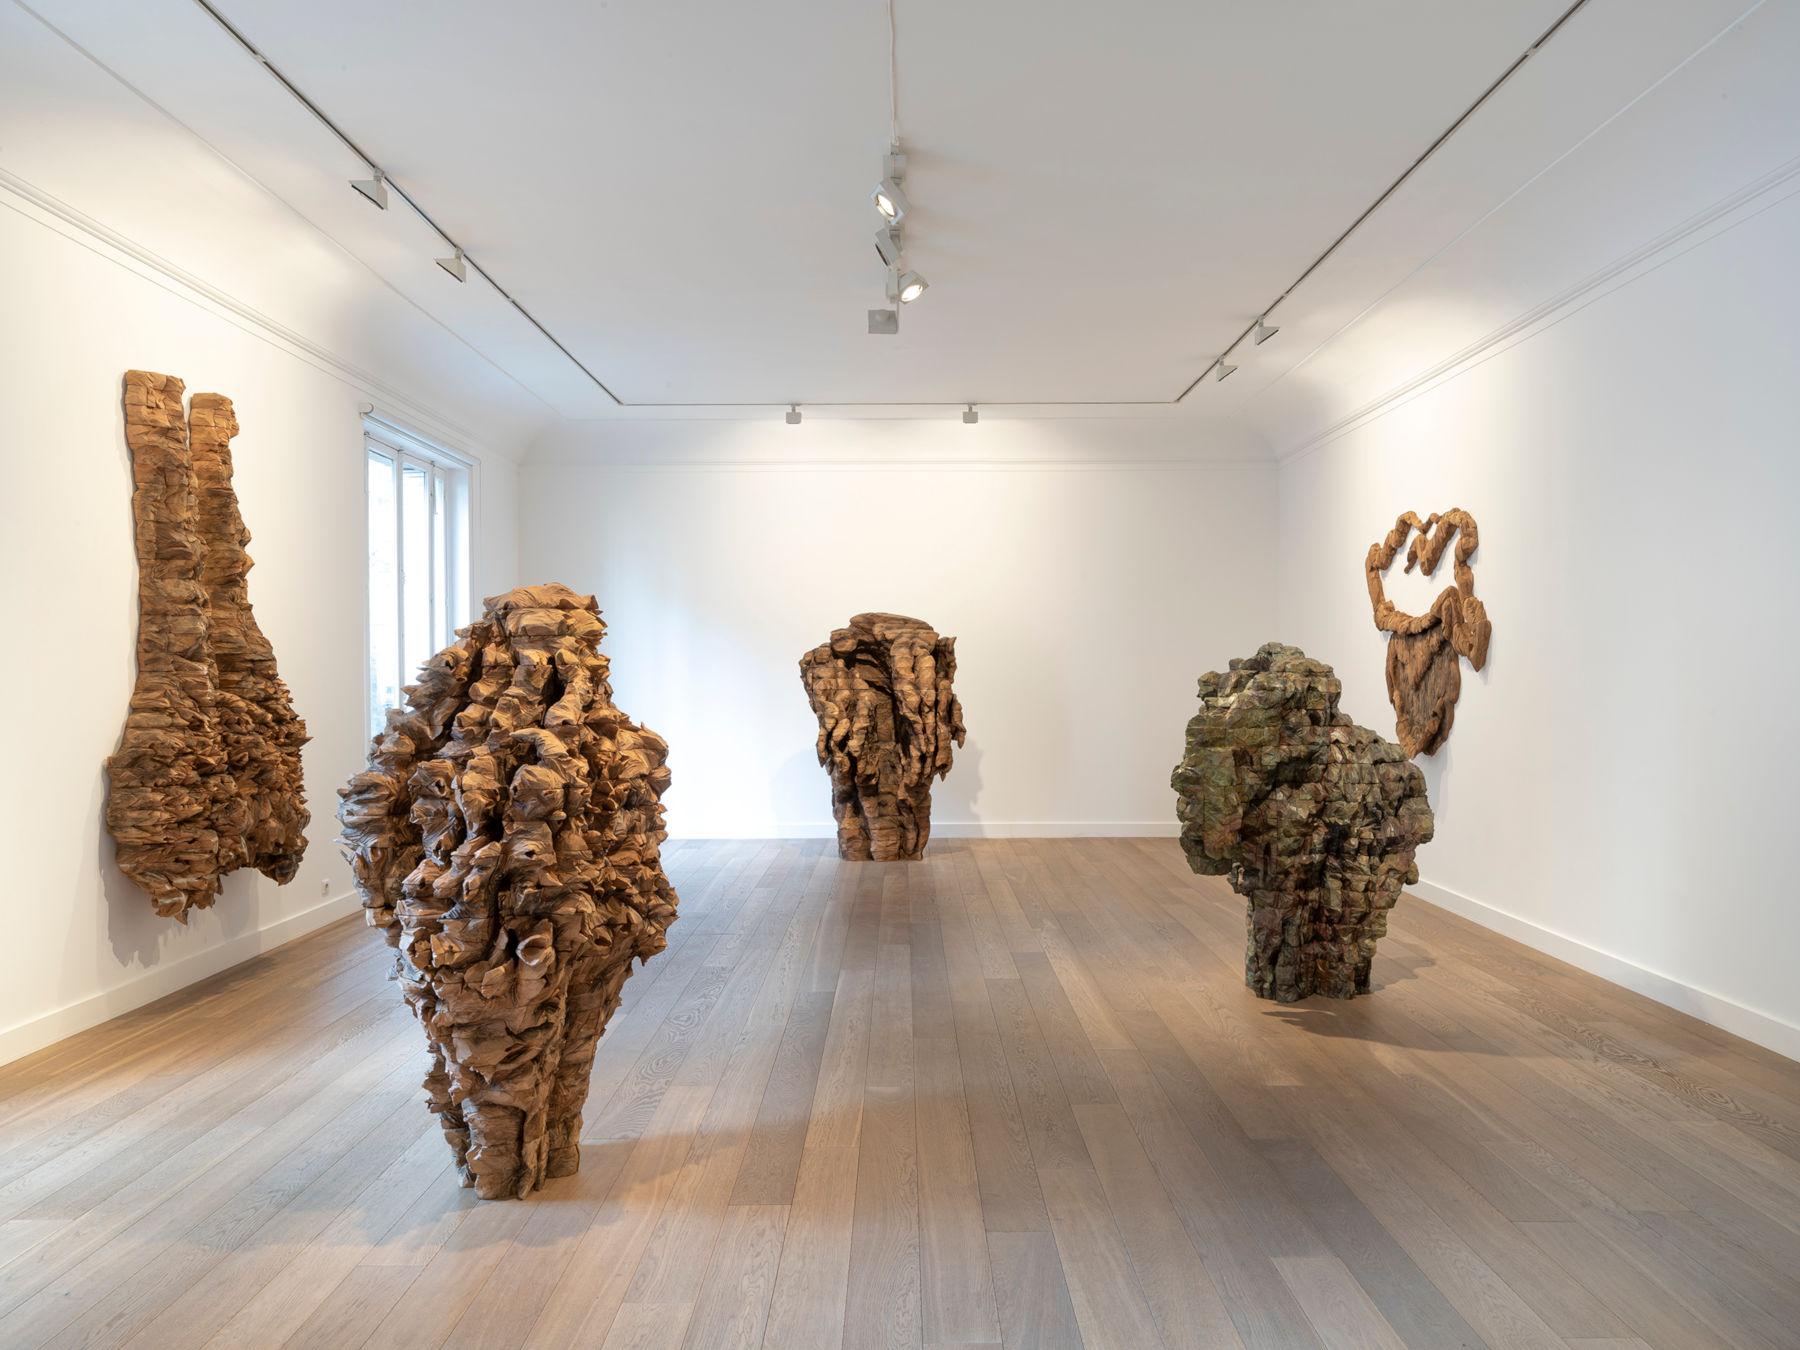 Galerie Lelong Ursula von Rydingsvard 1